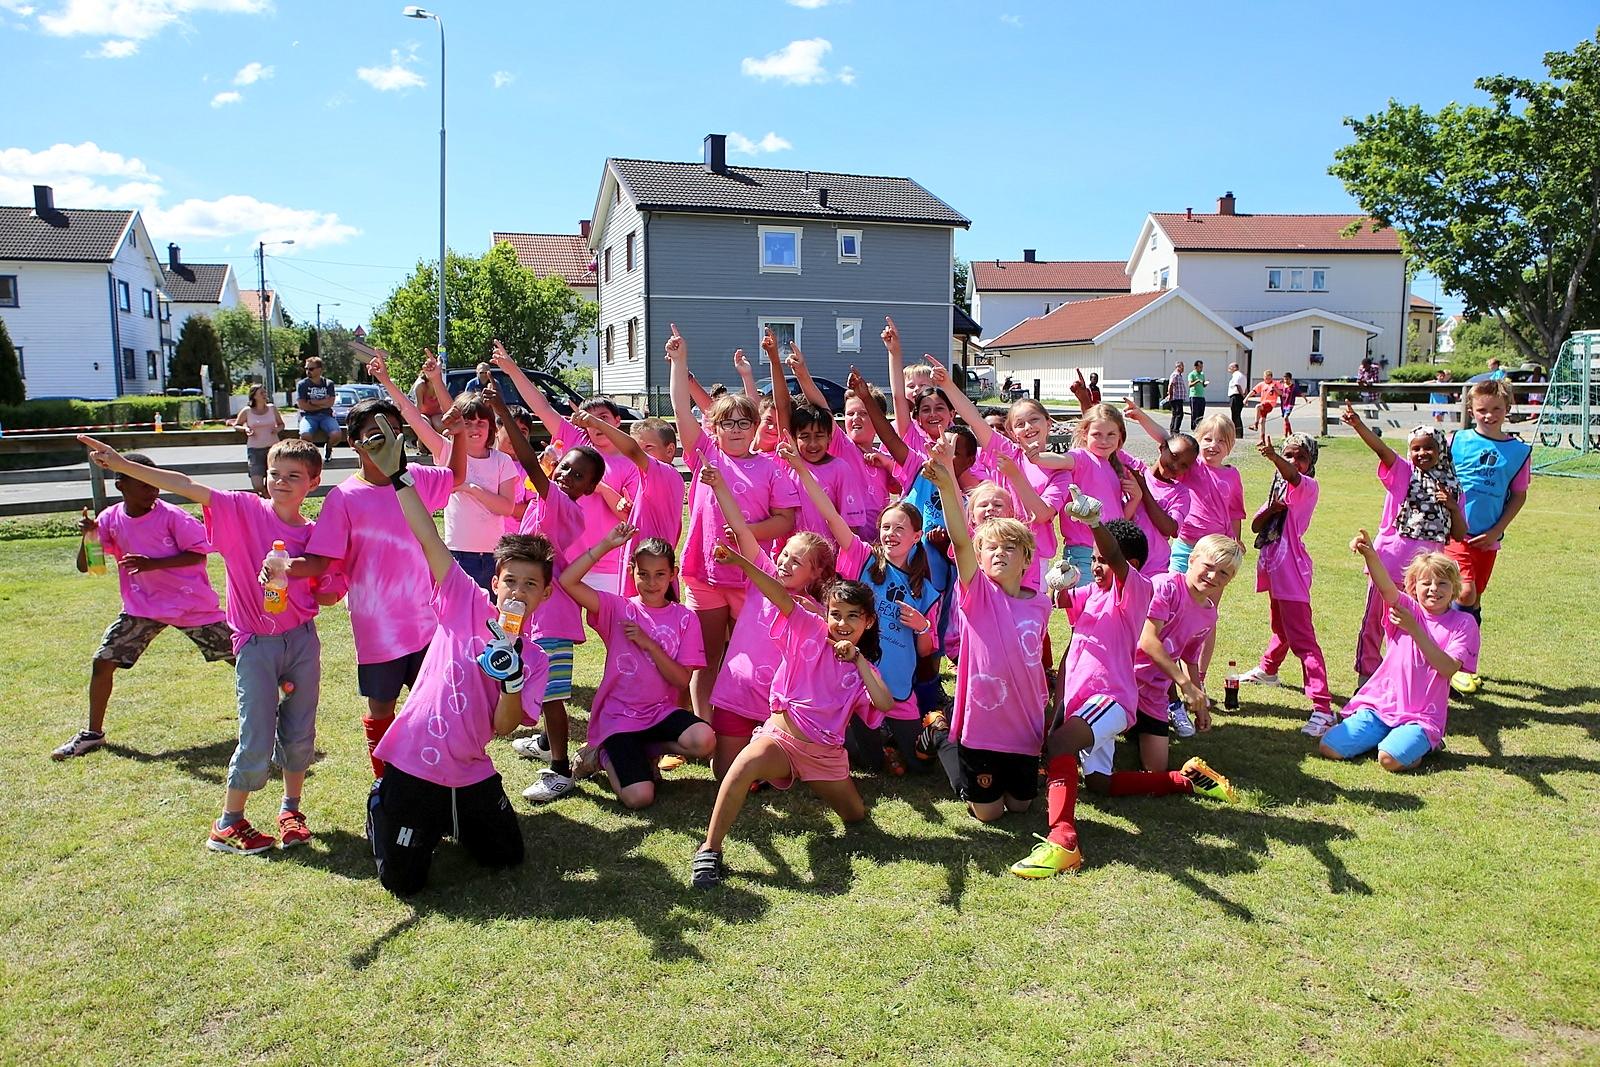 WorldCup StreetWorkout i Fredrikstad - Sport - bildeserier